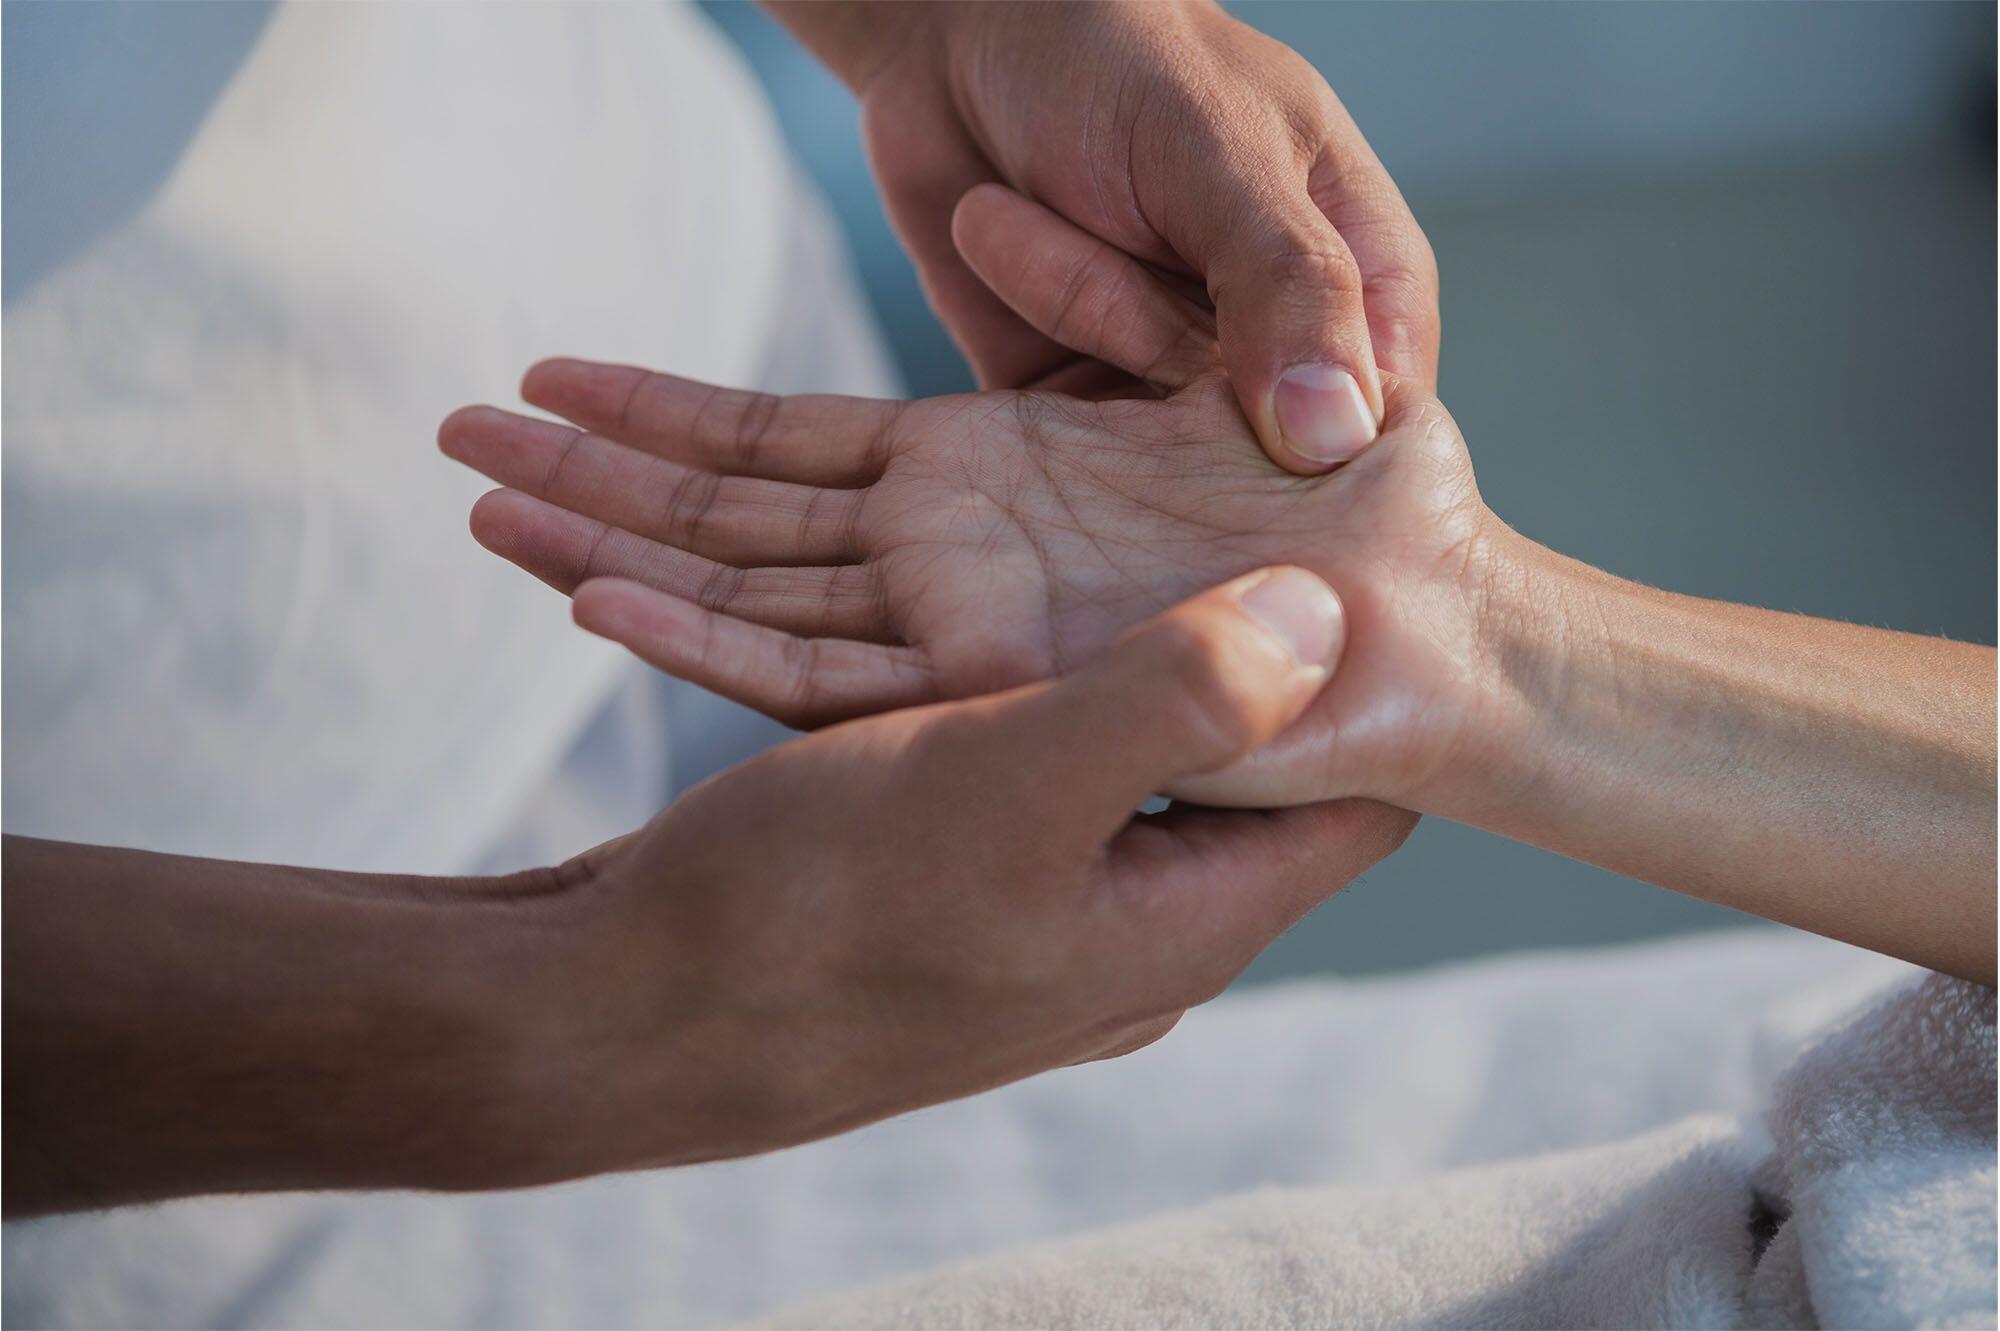 Hand & Wrist Pain Sydney